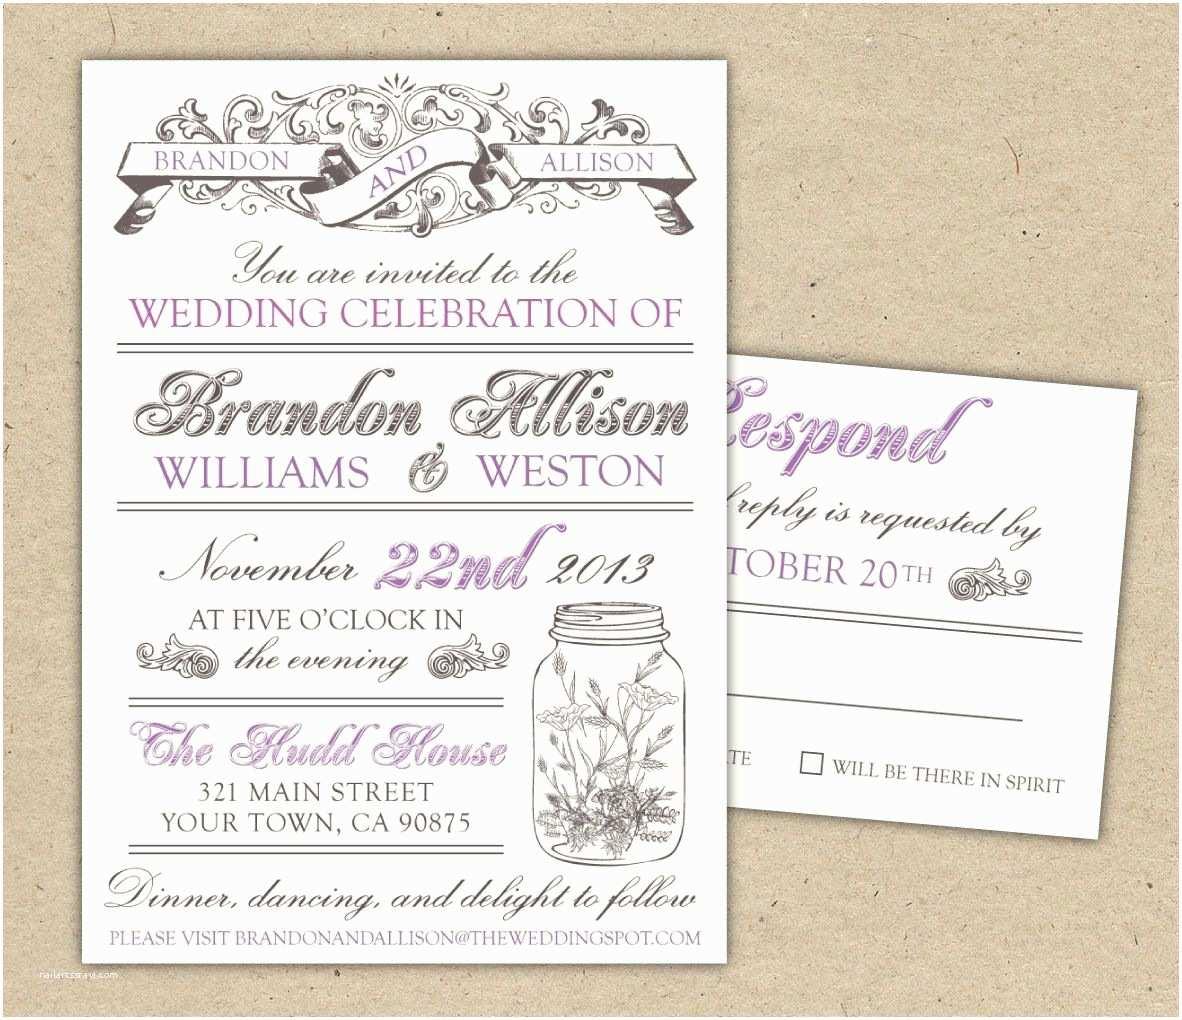 Free Wedding Invitation Templates for Word Free Templates for Invitations